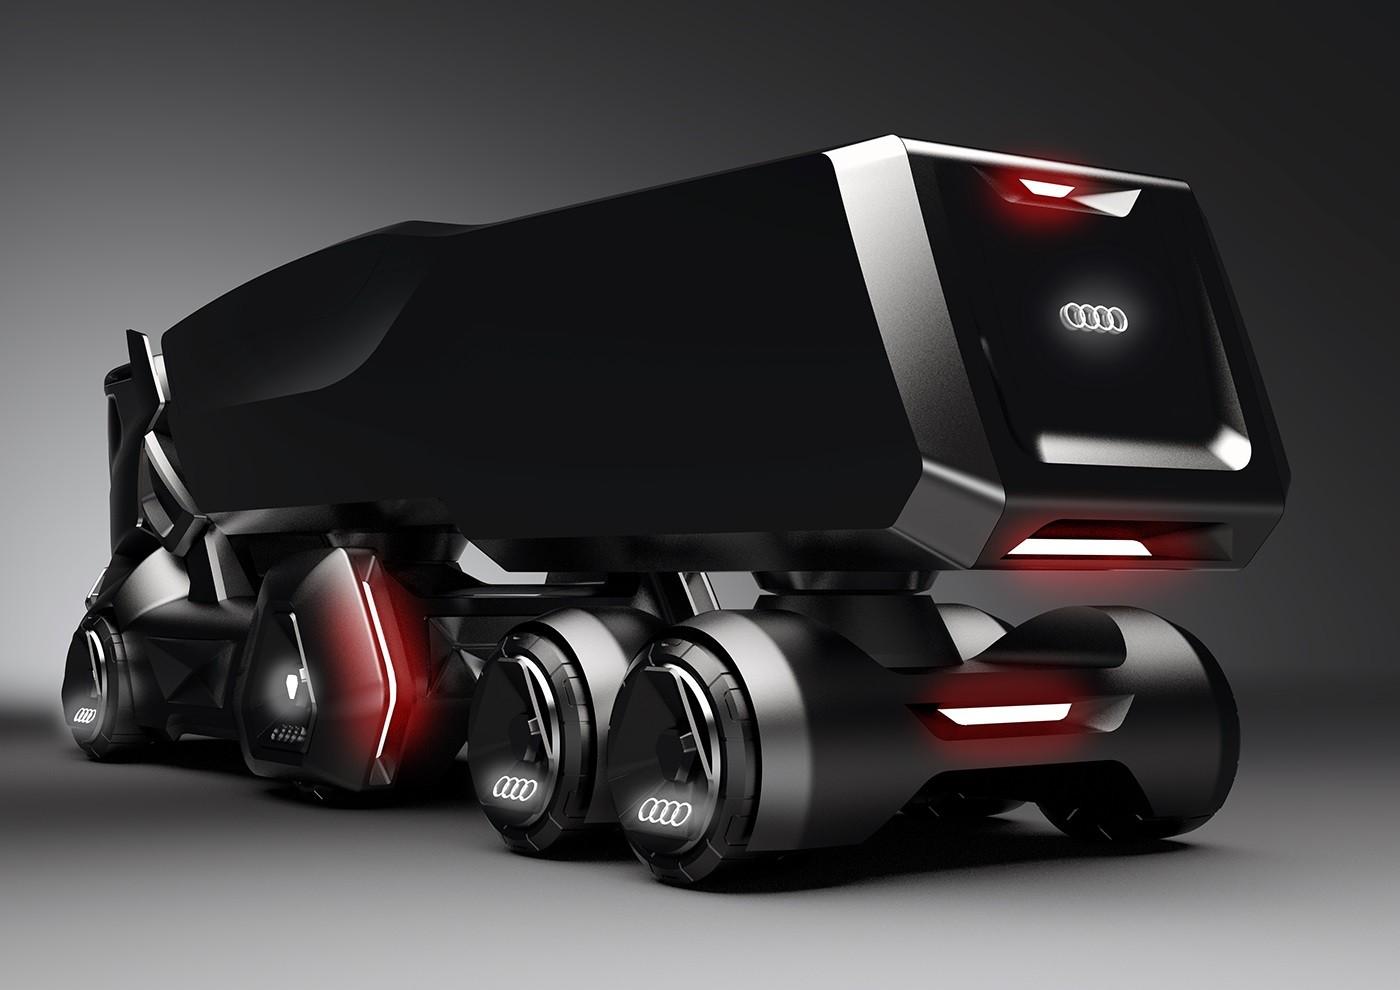 Custom Truck Headlights >> Audi-Themed HMV Concept Makes the Tesla Semi Look Obsolete - autoevolution